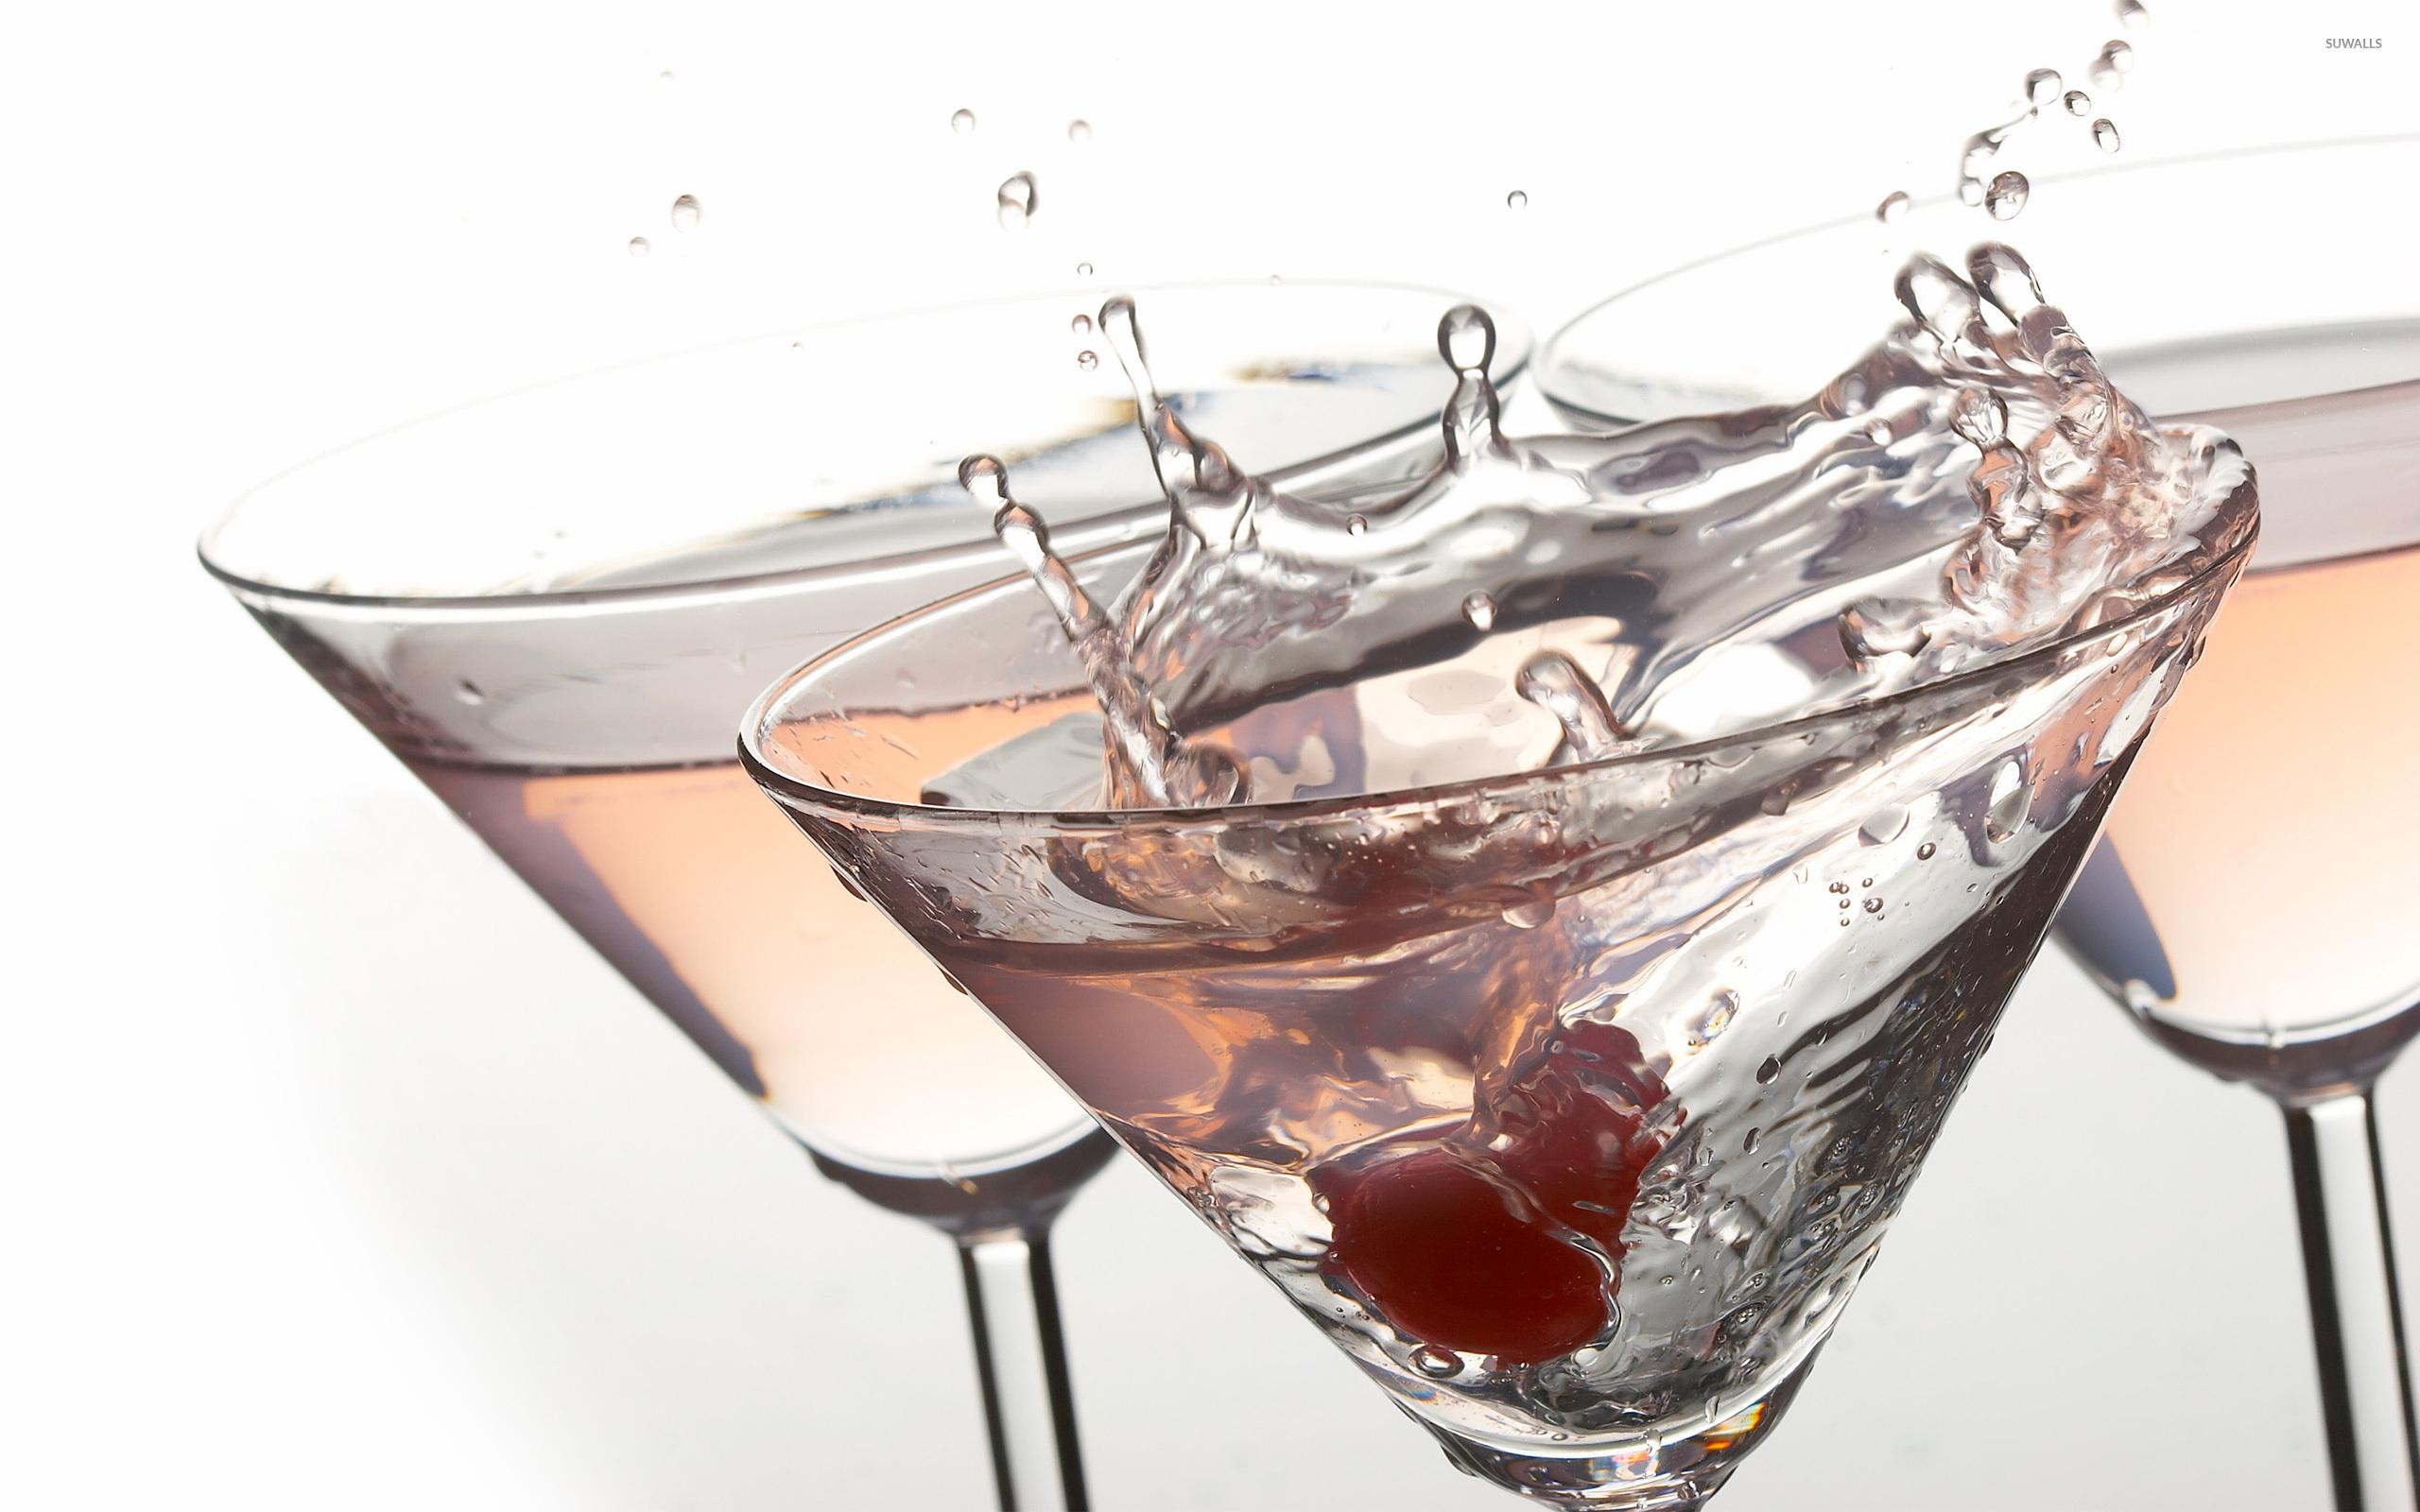 Cocktail คืออะไร นักดื่มรู้จัก หรือเปล่า